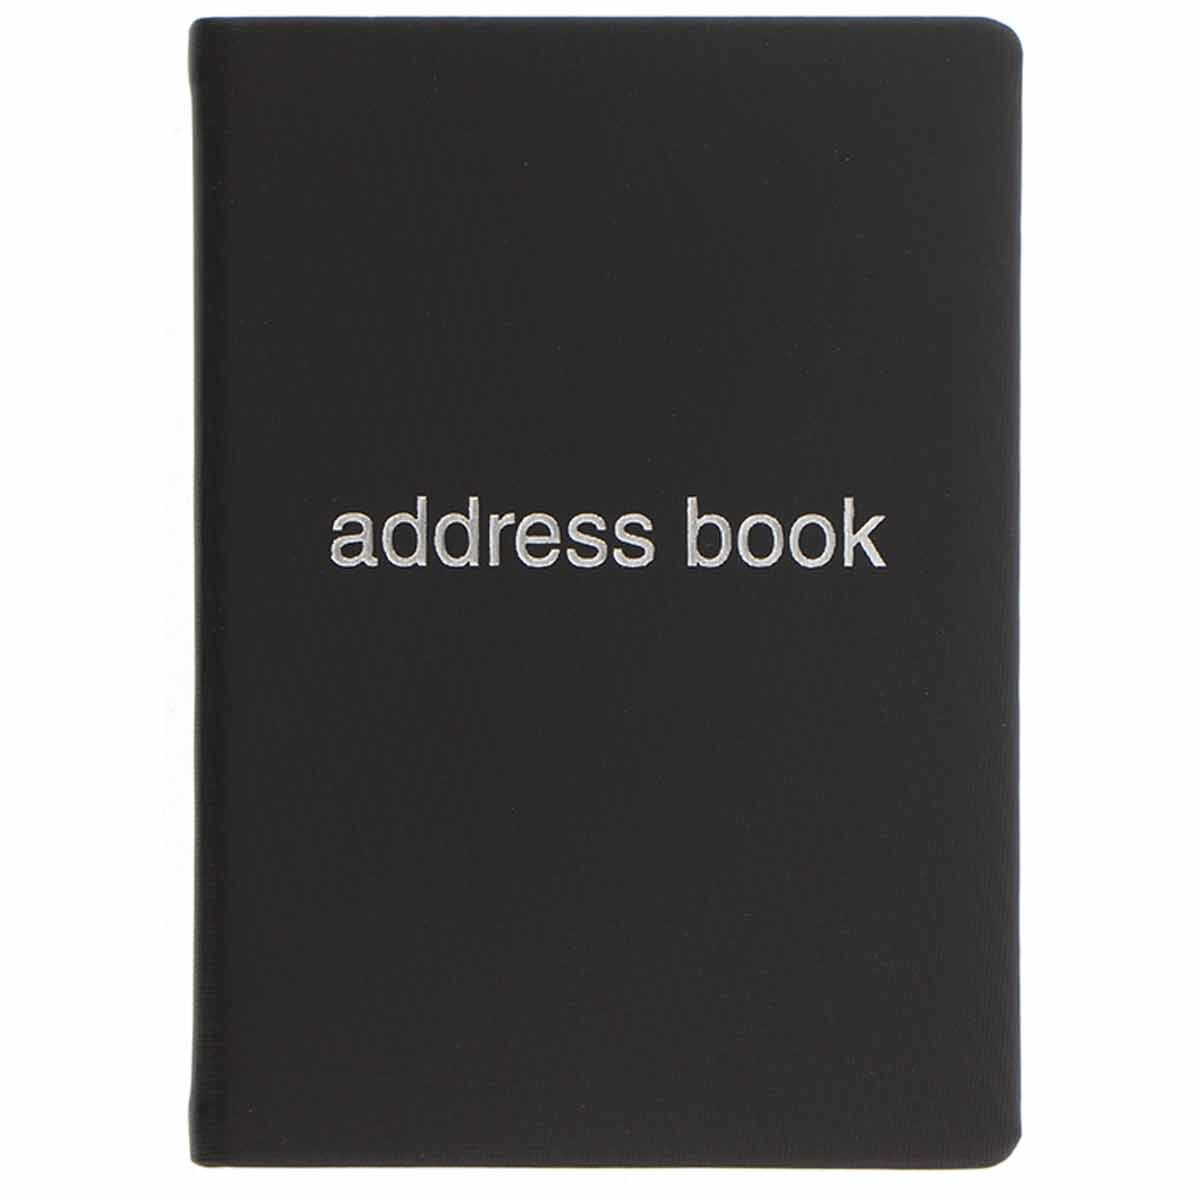 Letts Dazzle A6 Address Book Black